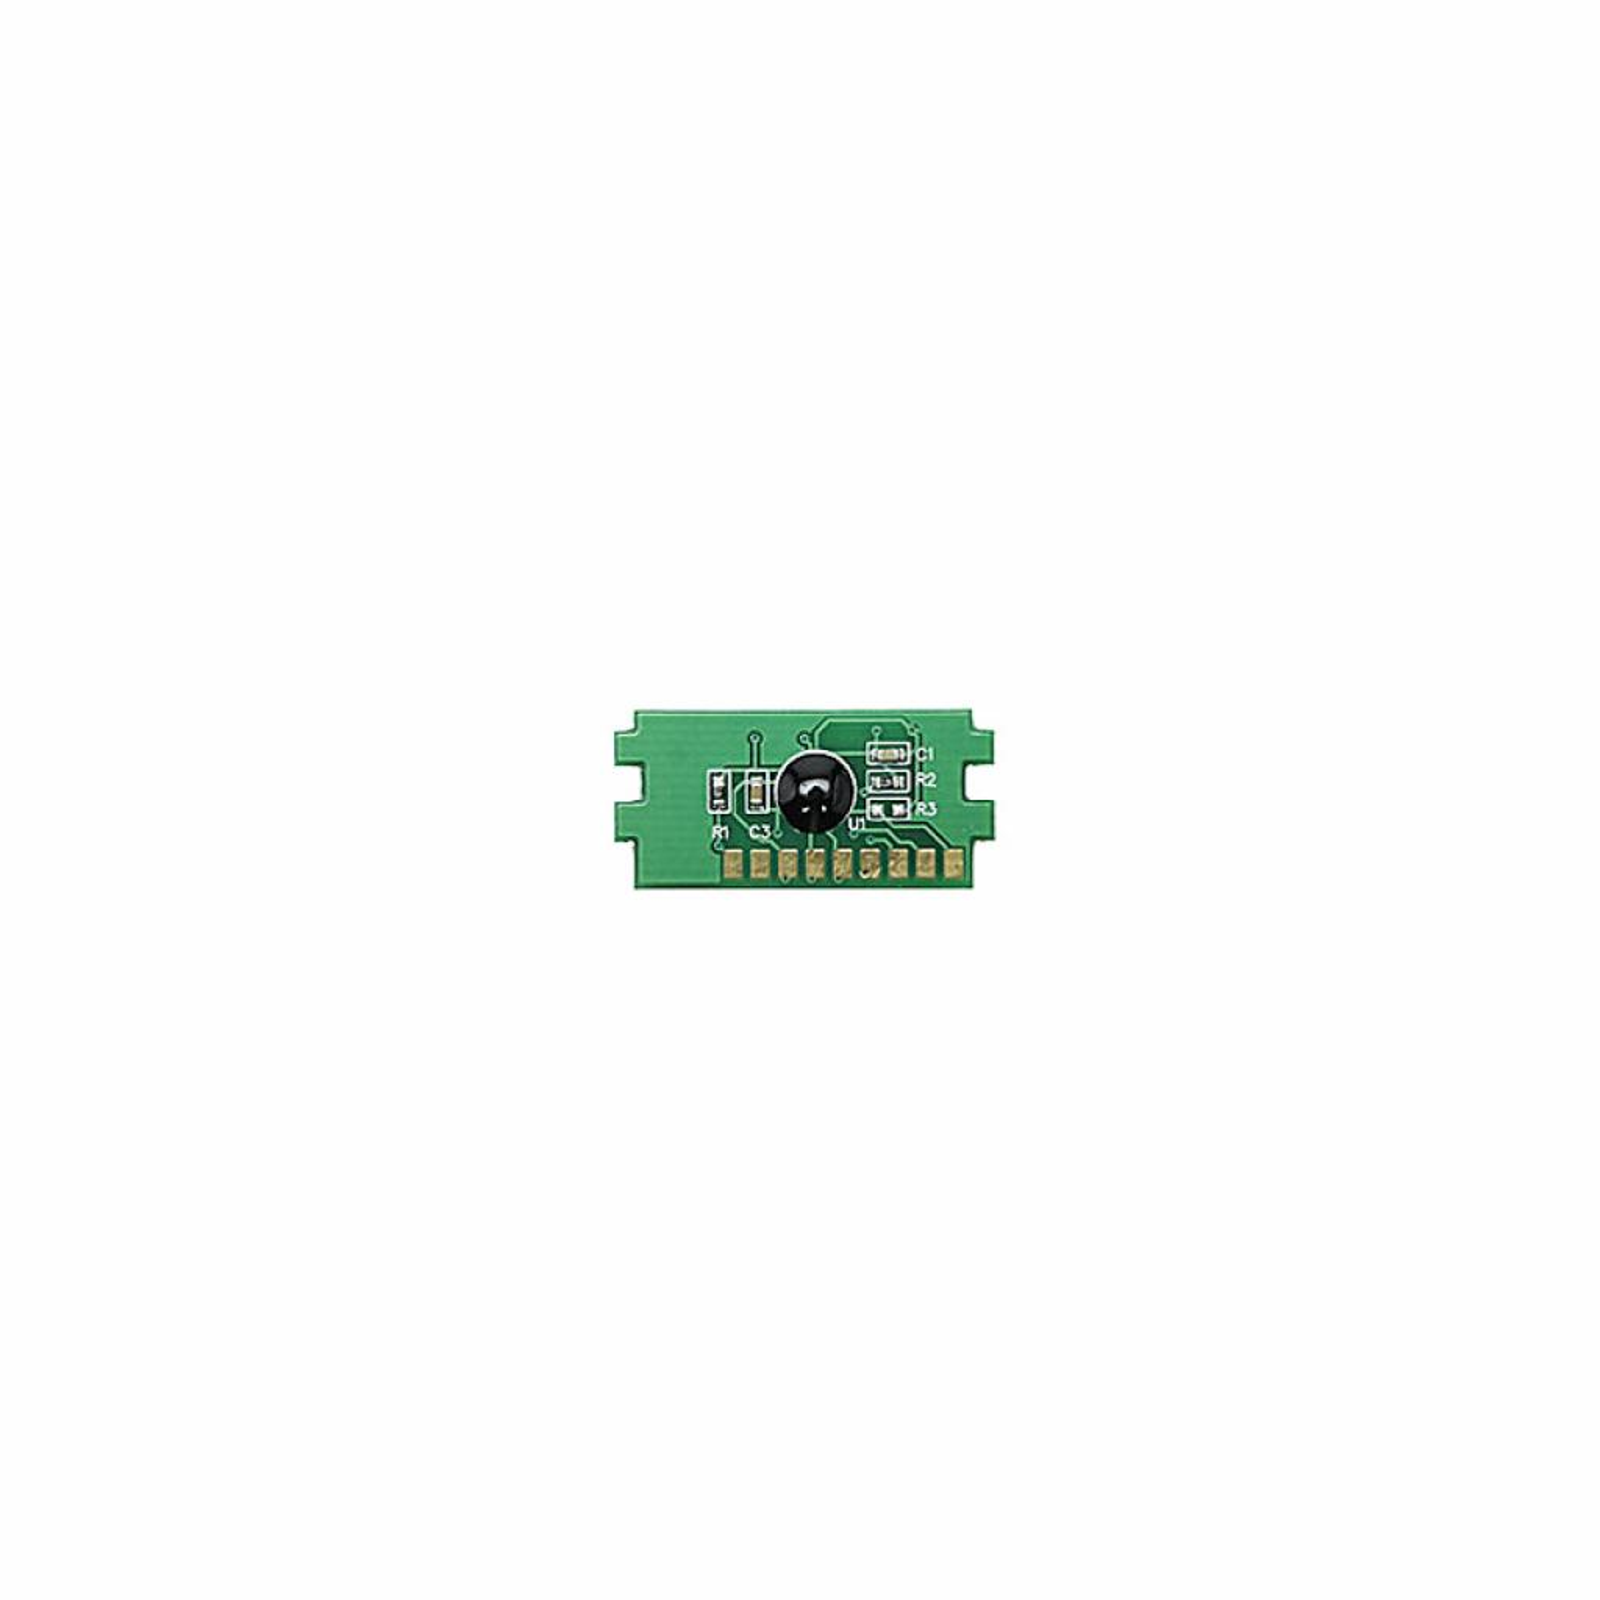 Чип для картриджа Kyocera TK-5160Y (EU) 12k yellow Static Control (TK5160CP-YEU)